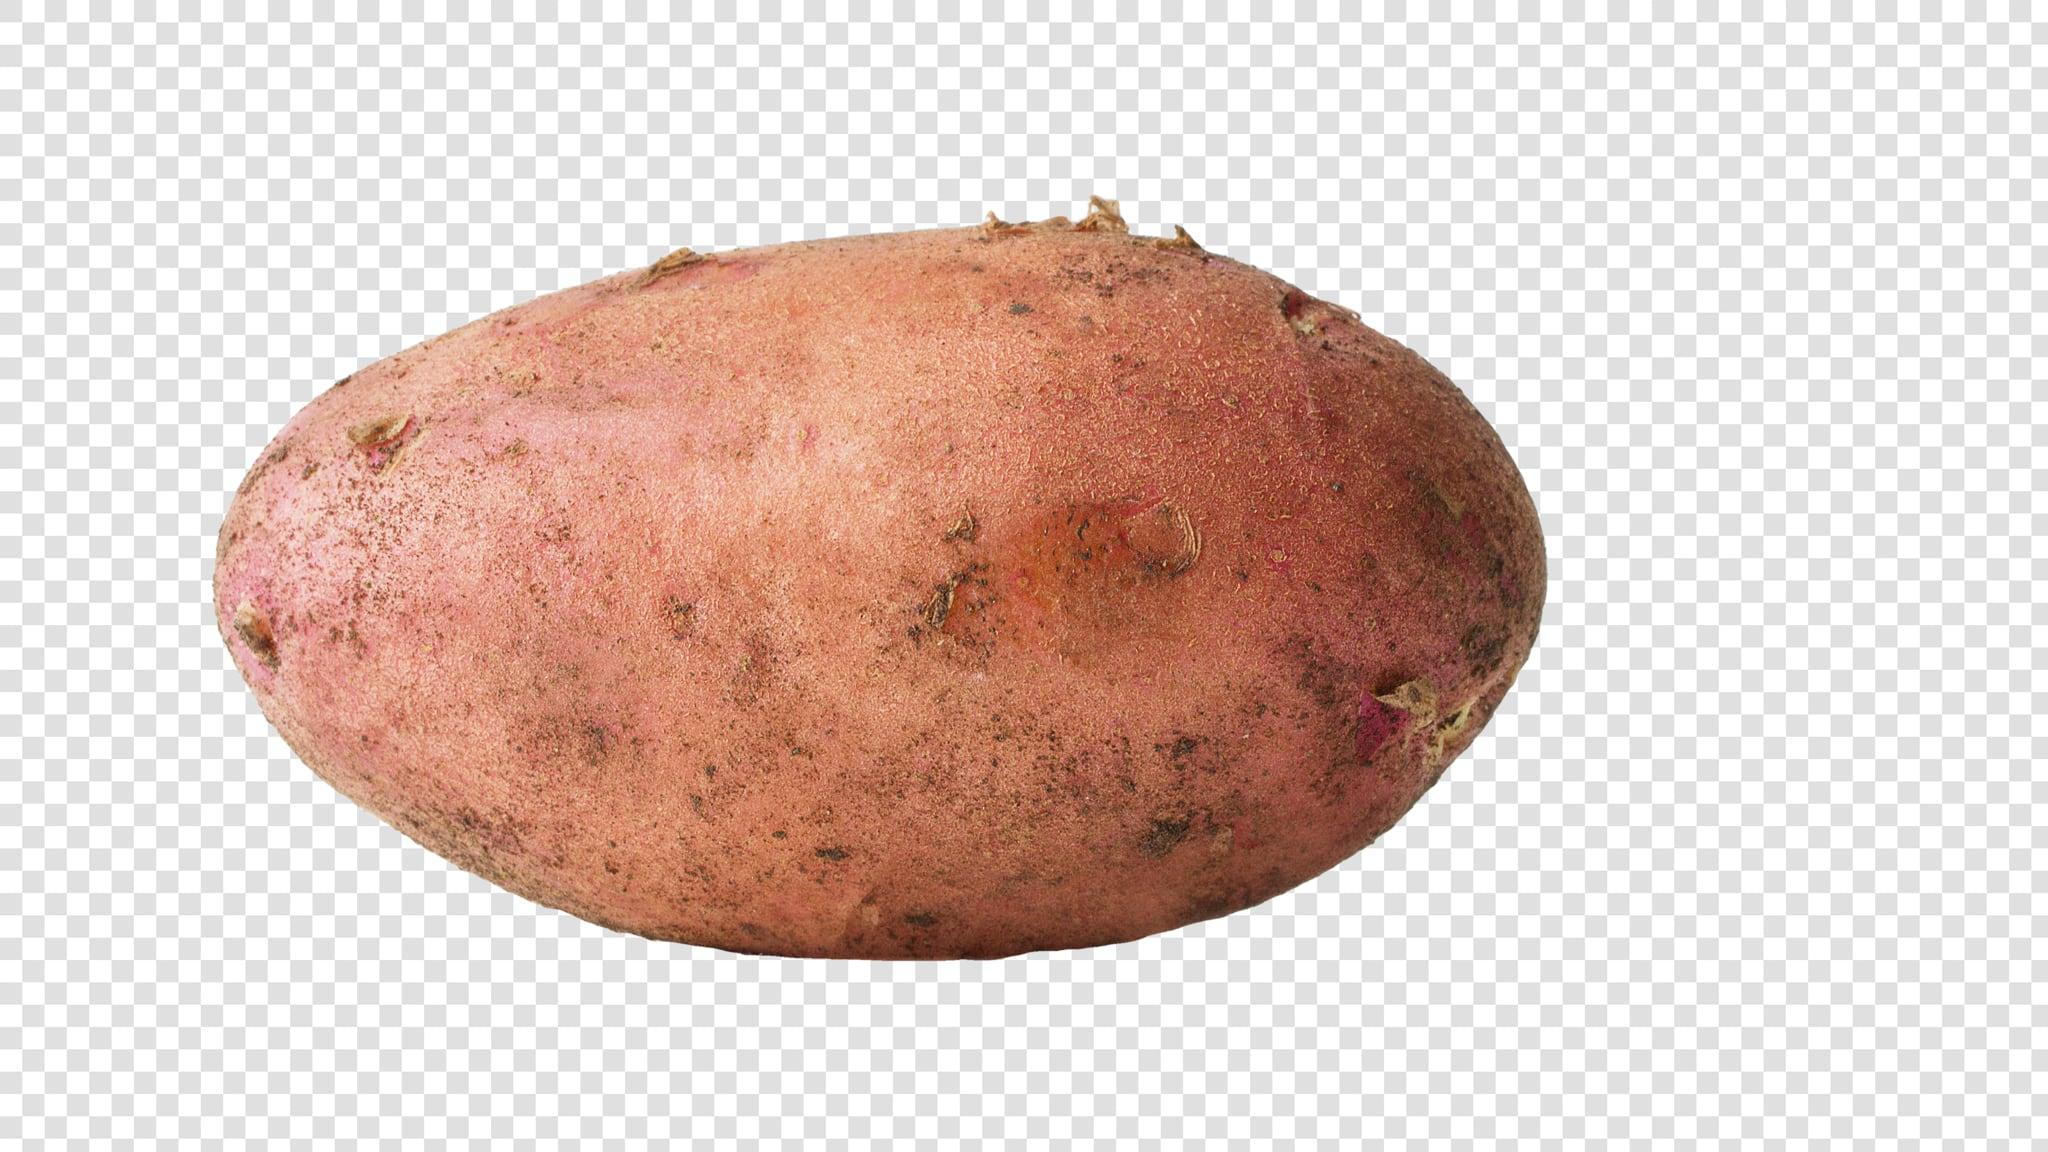 Potato PSD isolated image